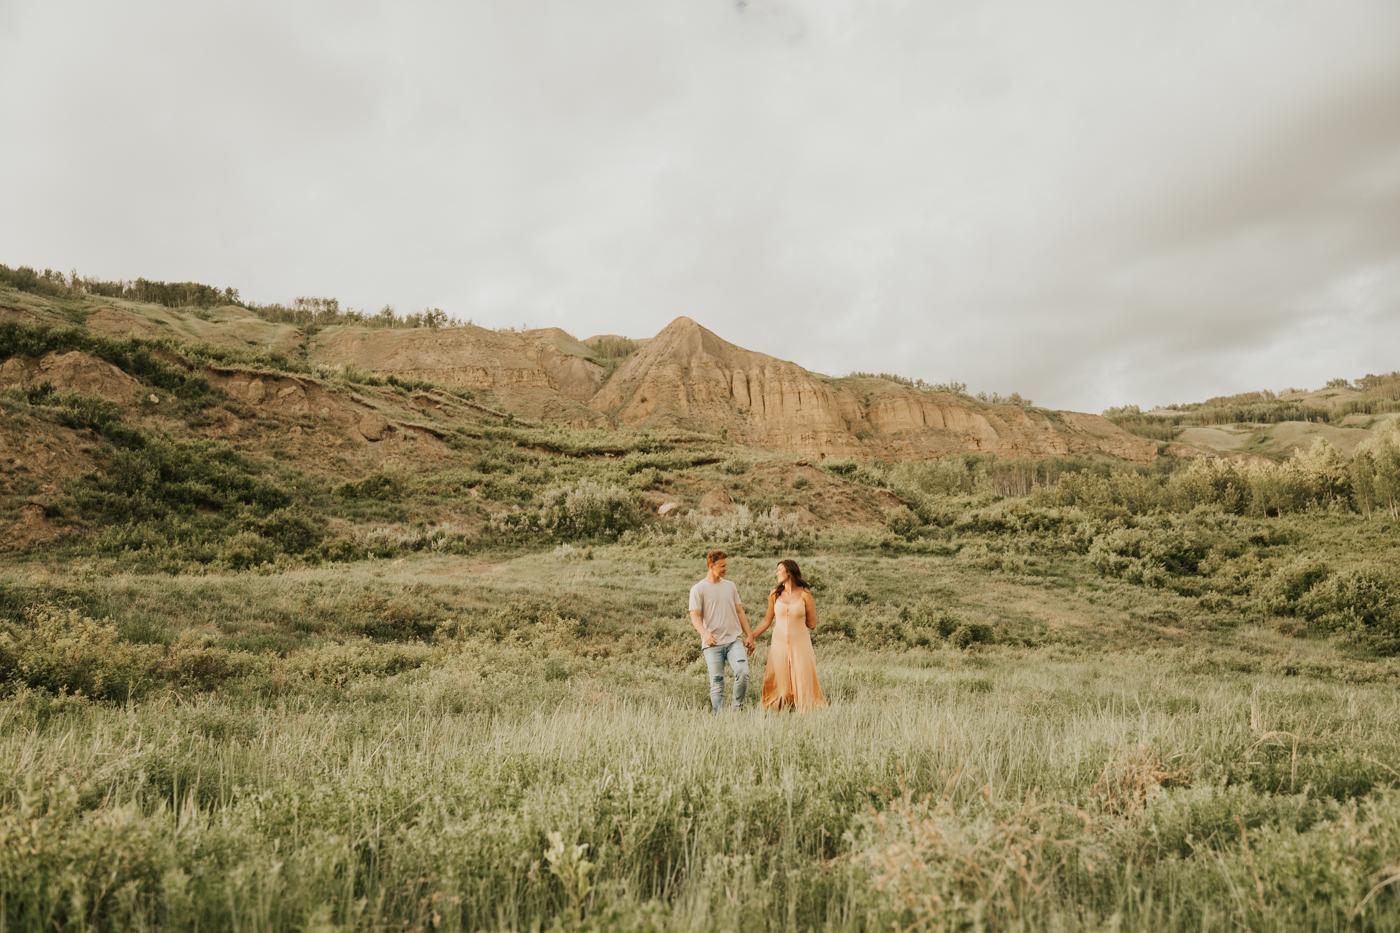 tyraephotography_photographer_wedding_elopement_engagement_photography-04450.jpg